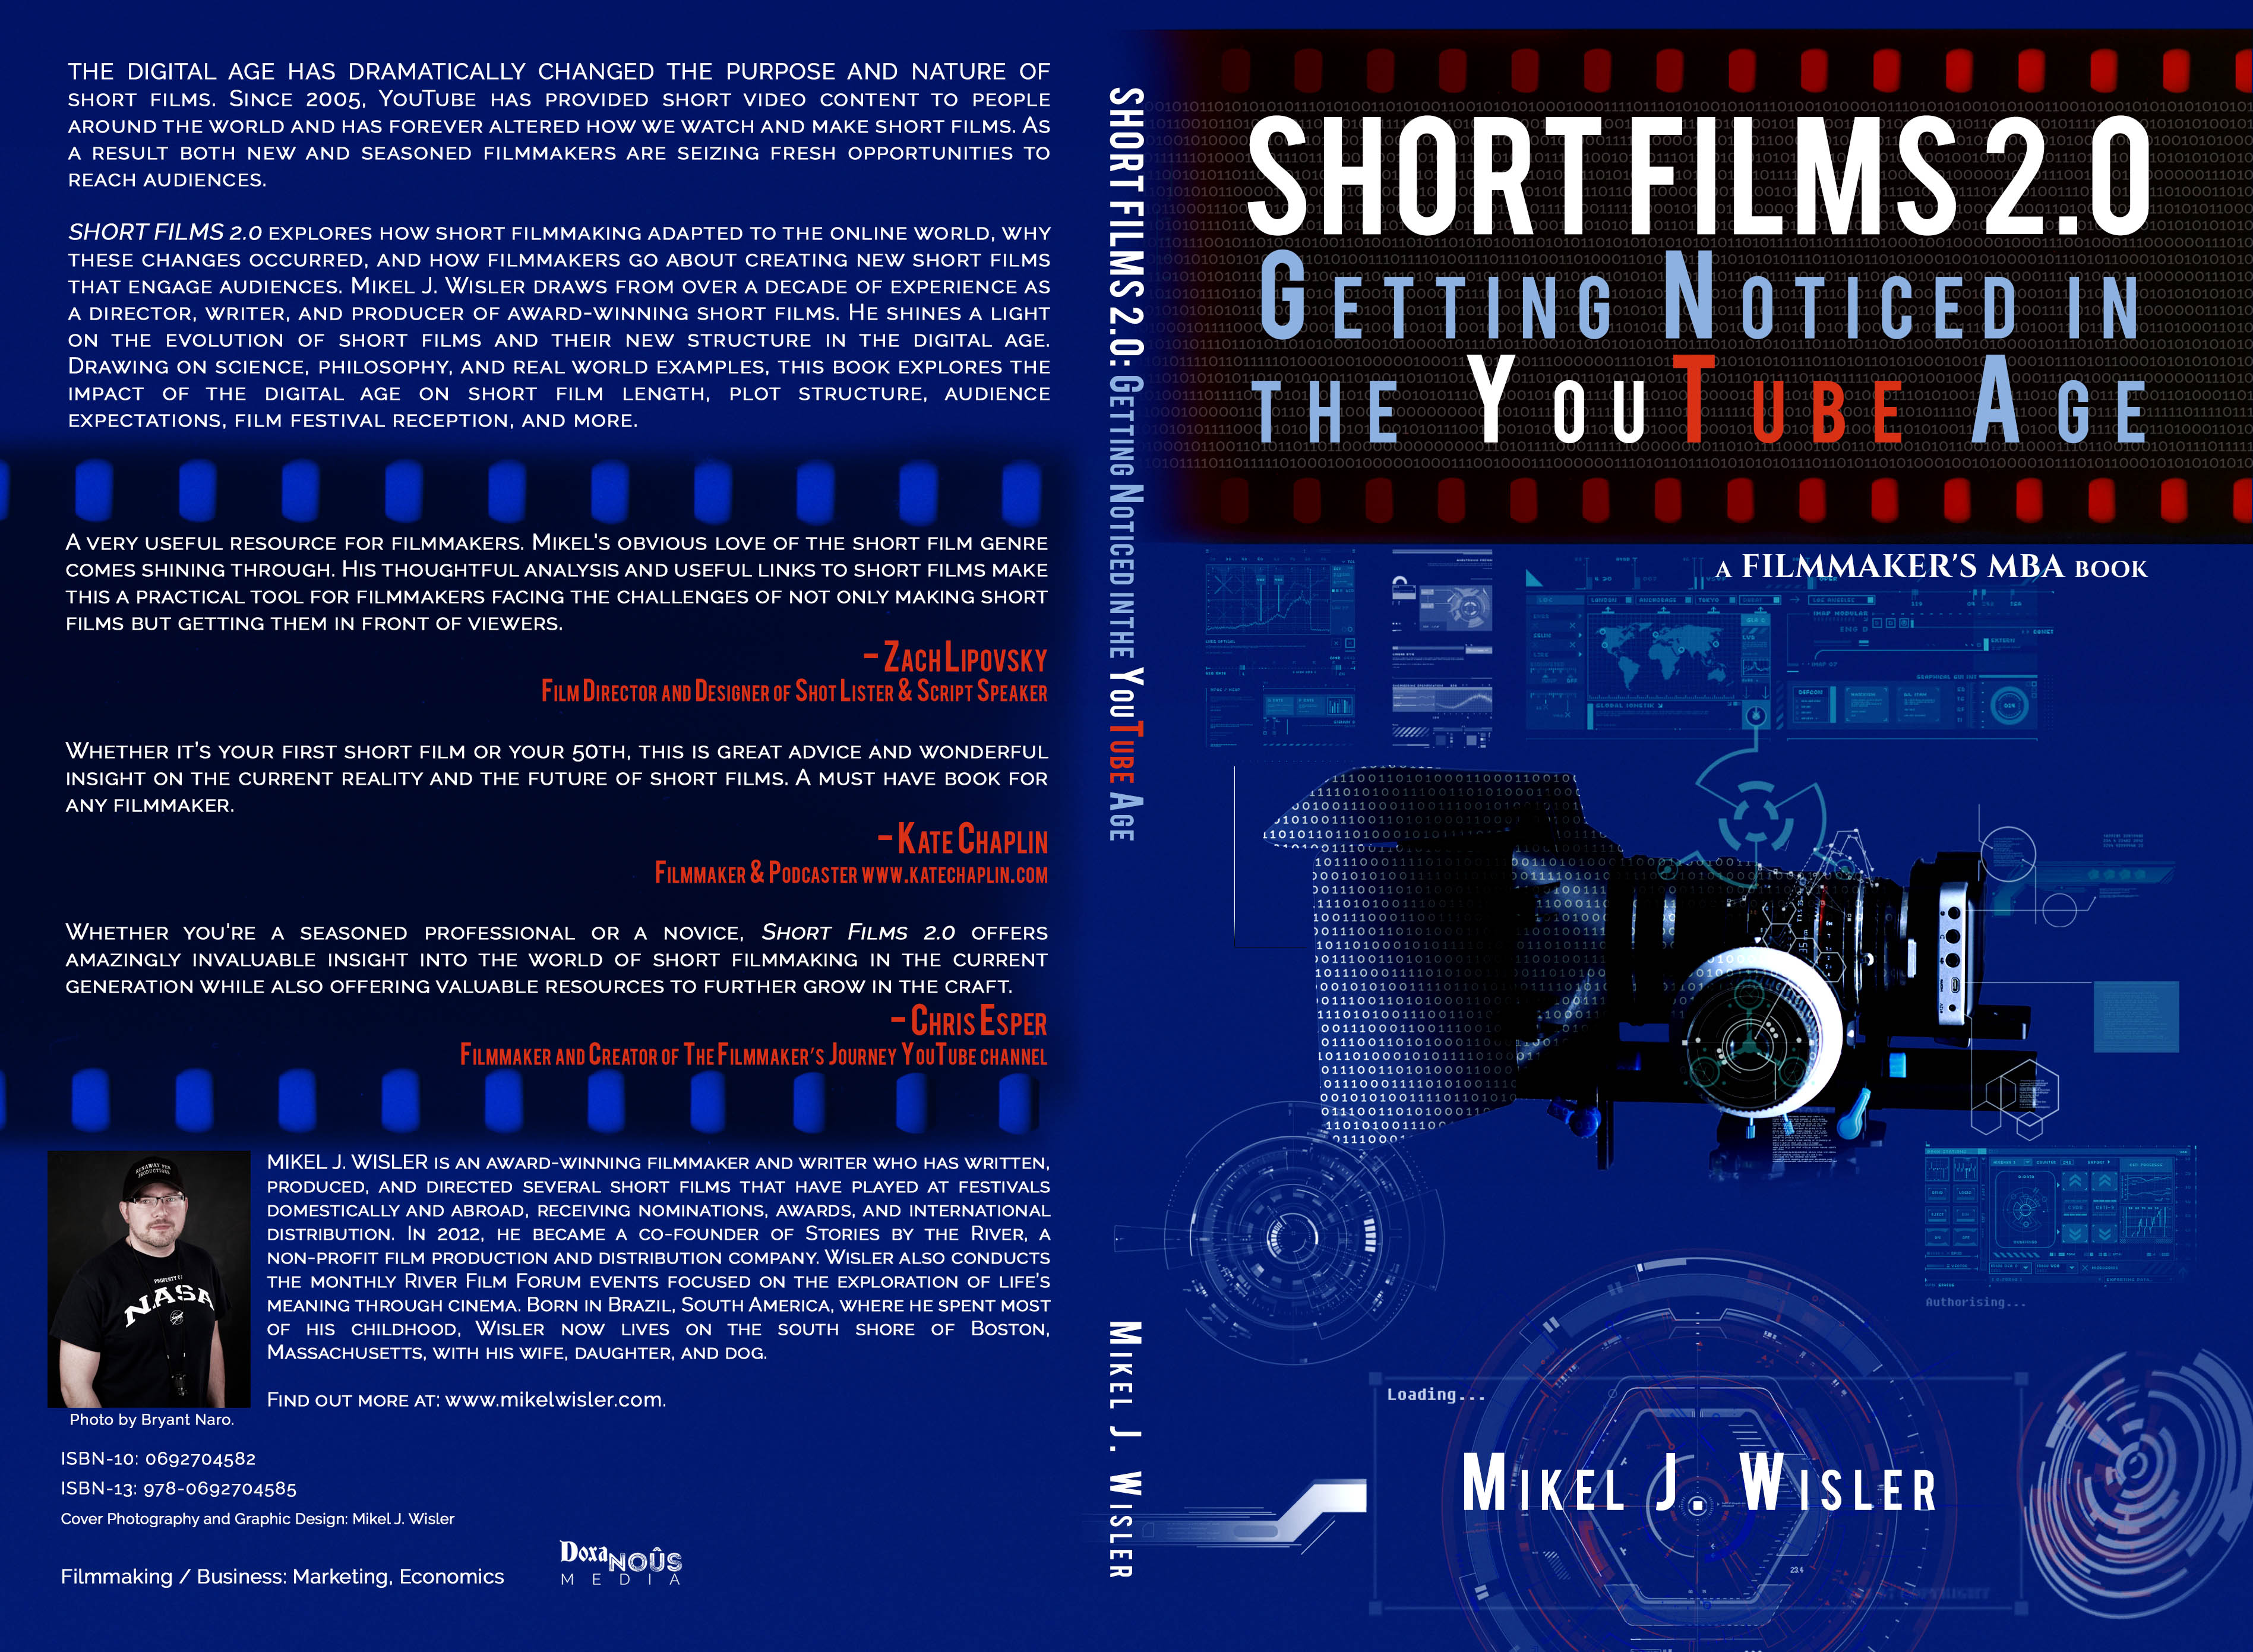 Short Films 2.0 Book